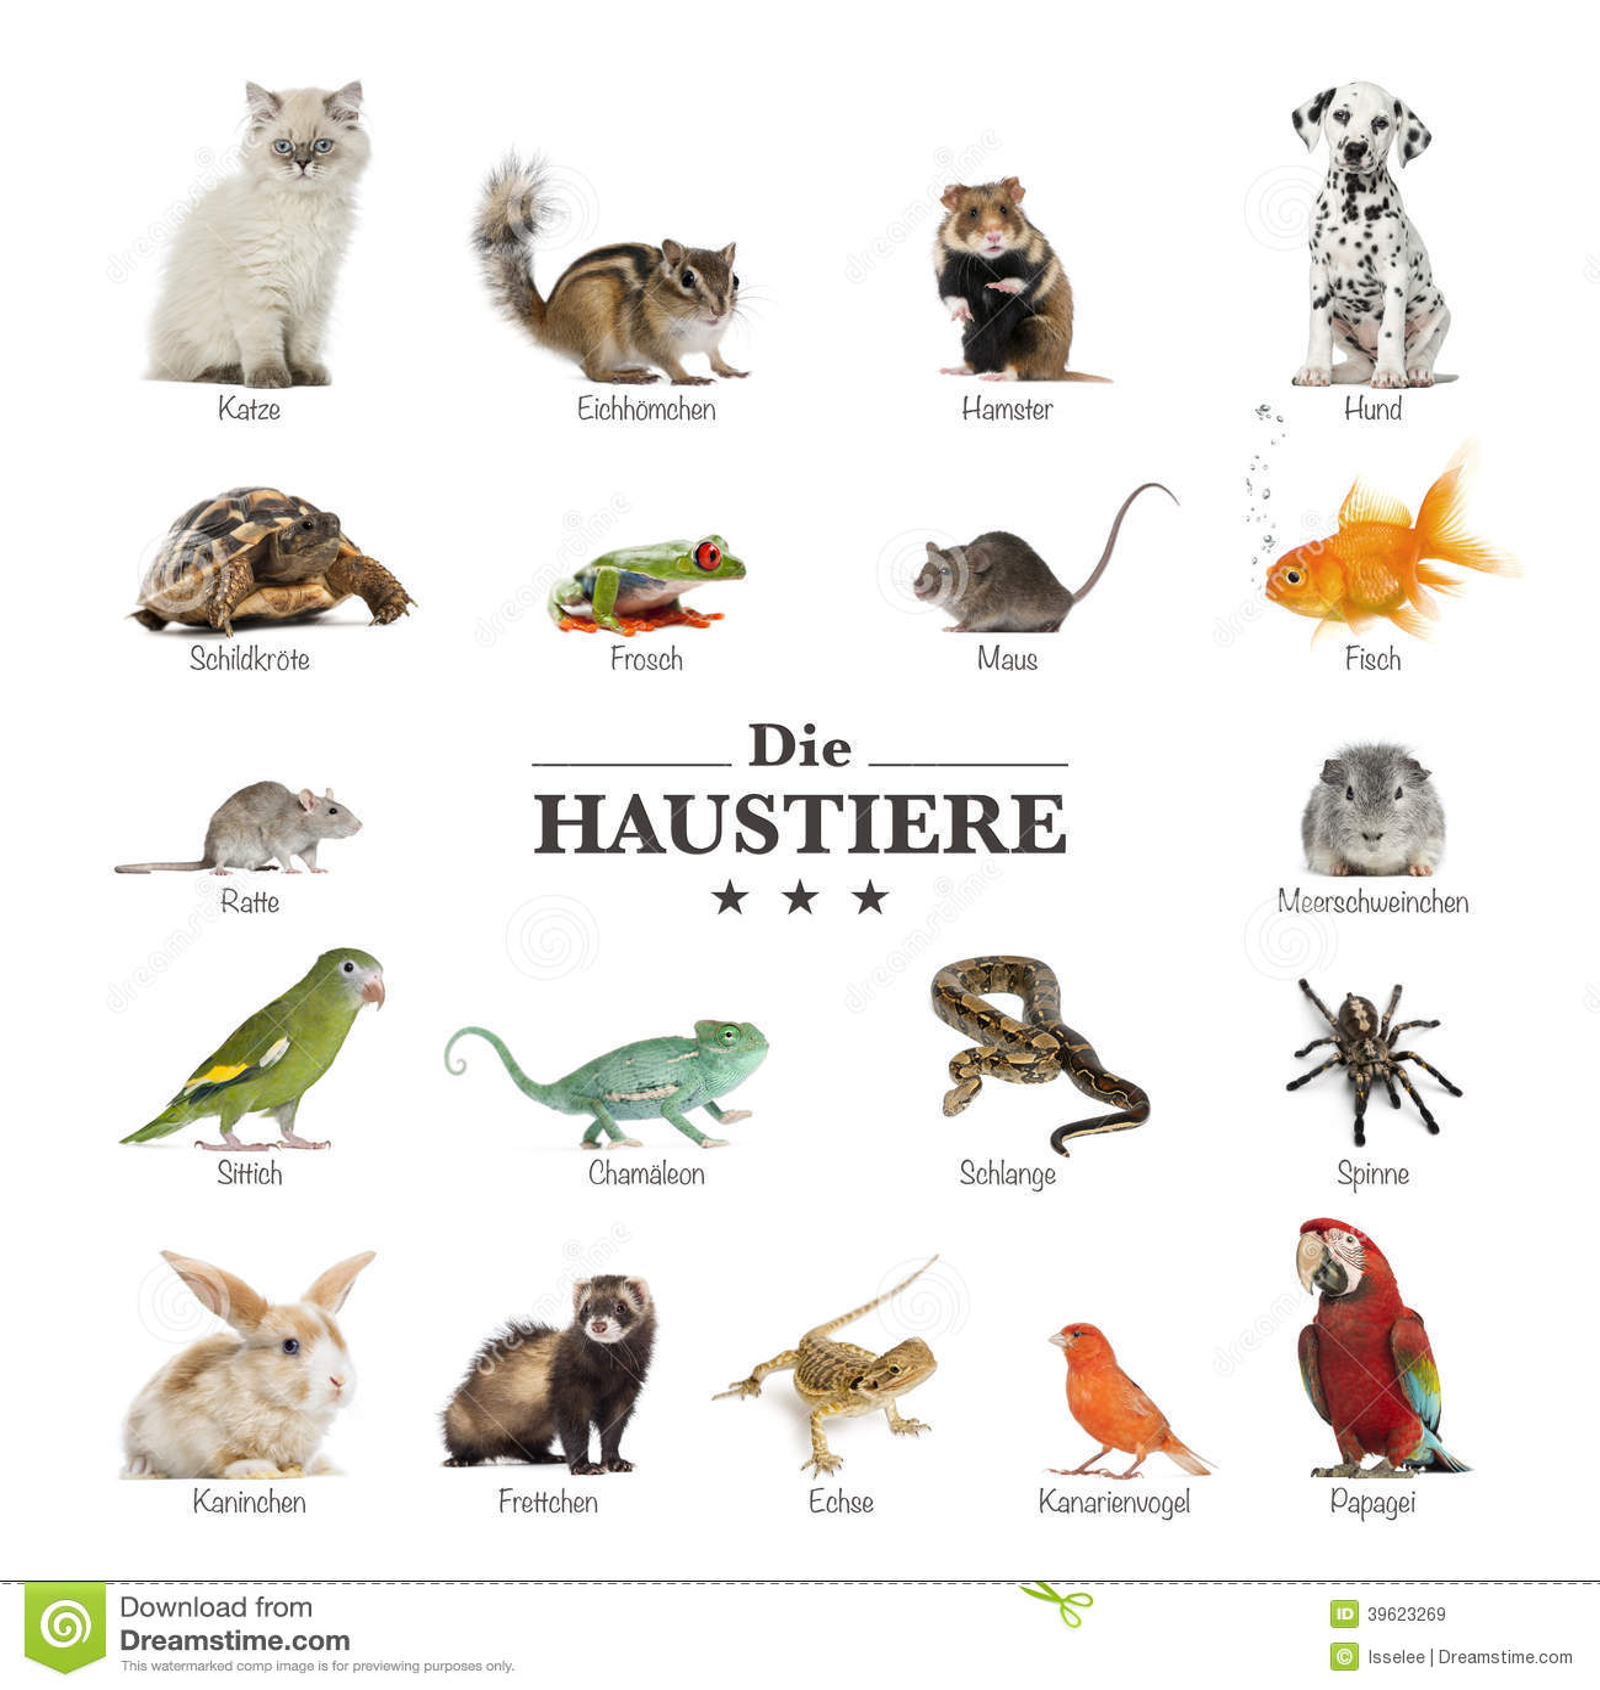 affiche des animaux familiers en allemand image stock image 39623269. Black Bedroom Furniture Sets. Home Design Ideas